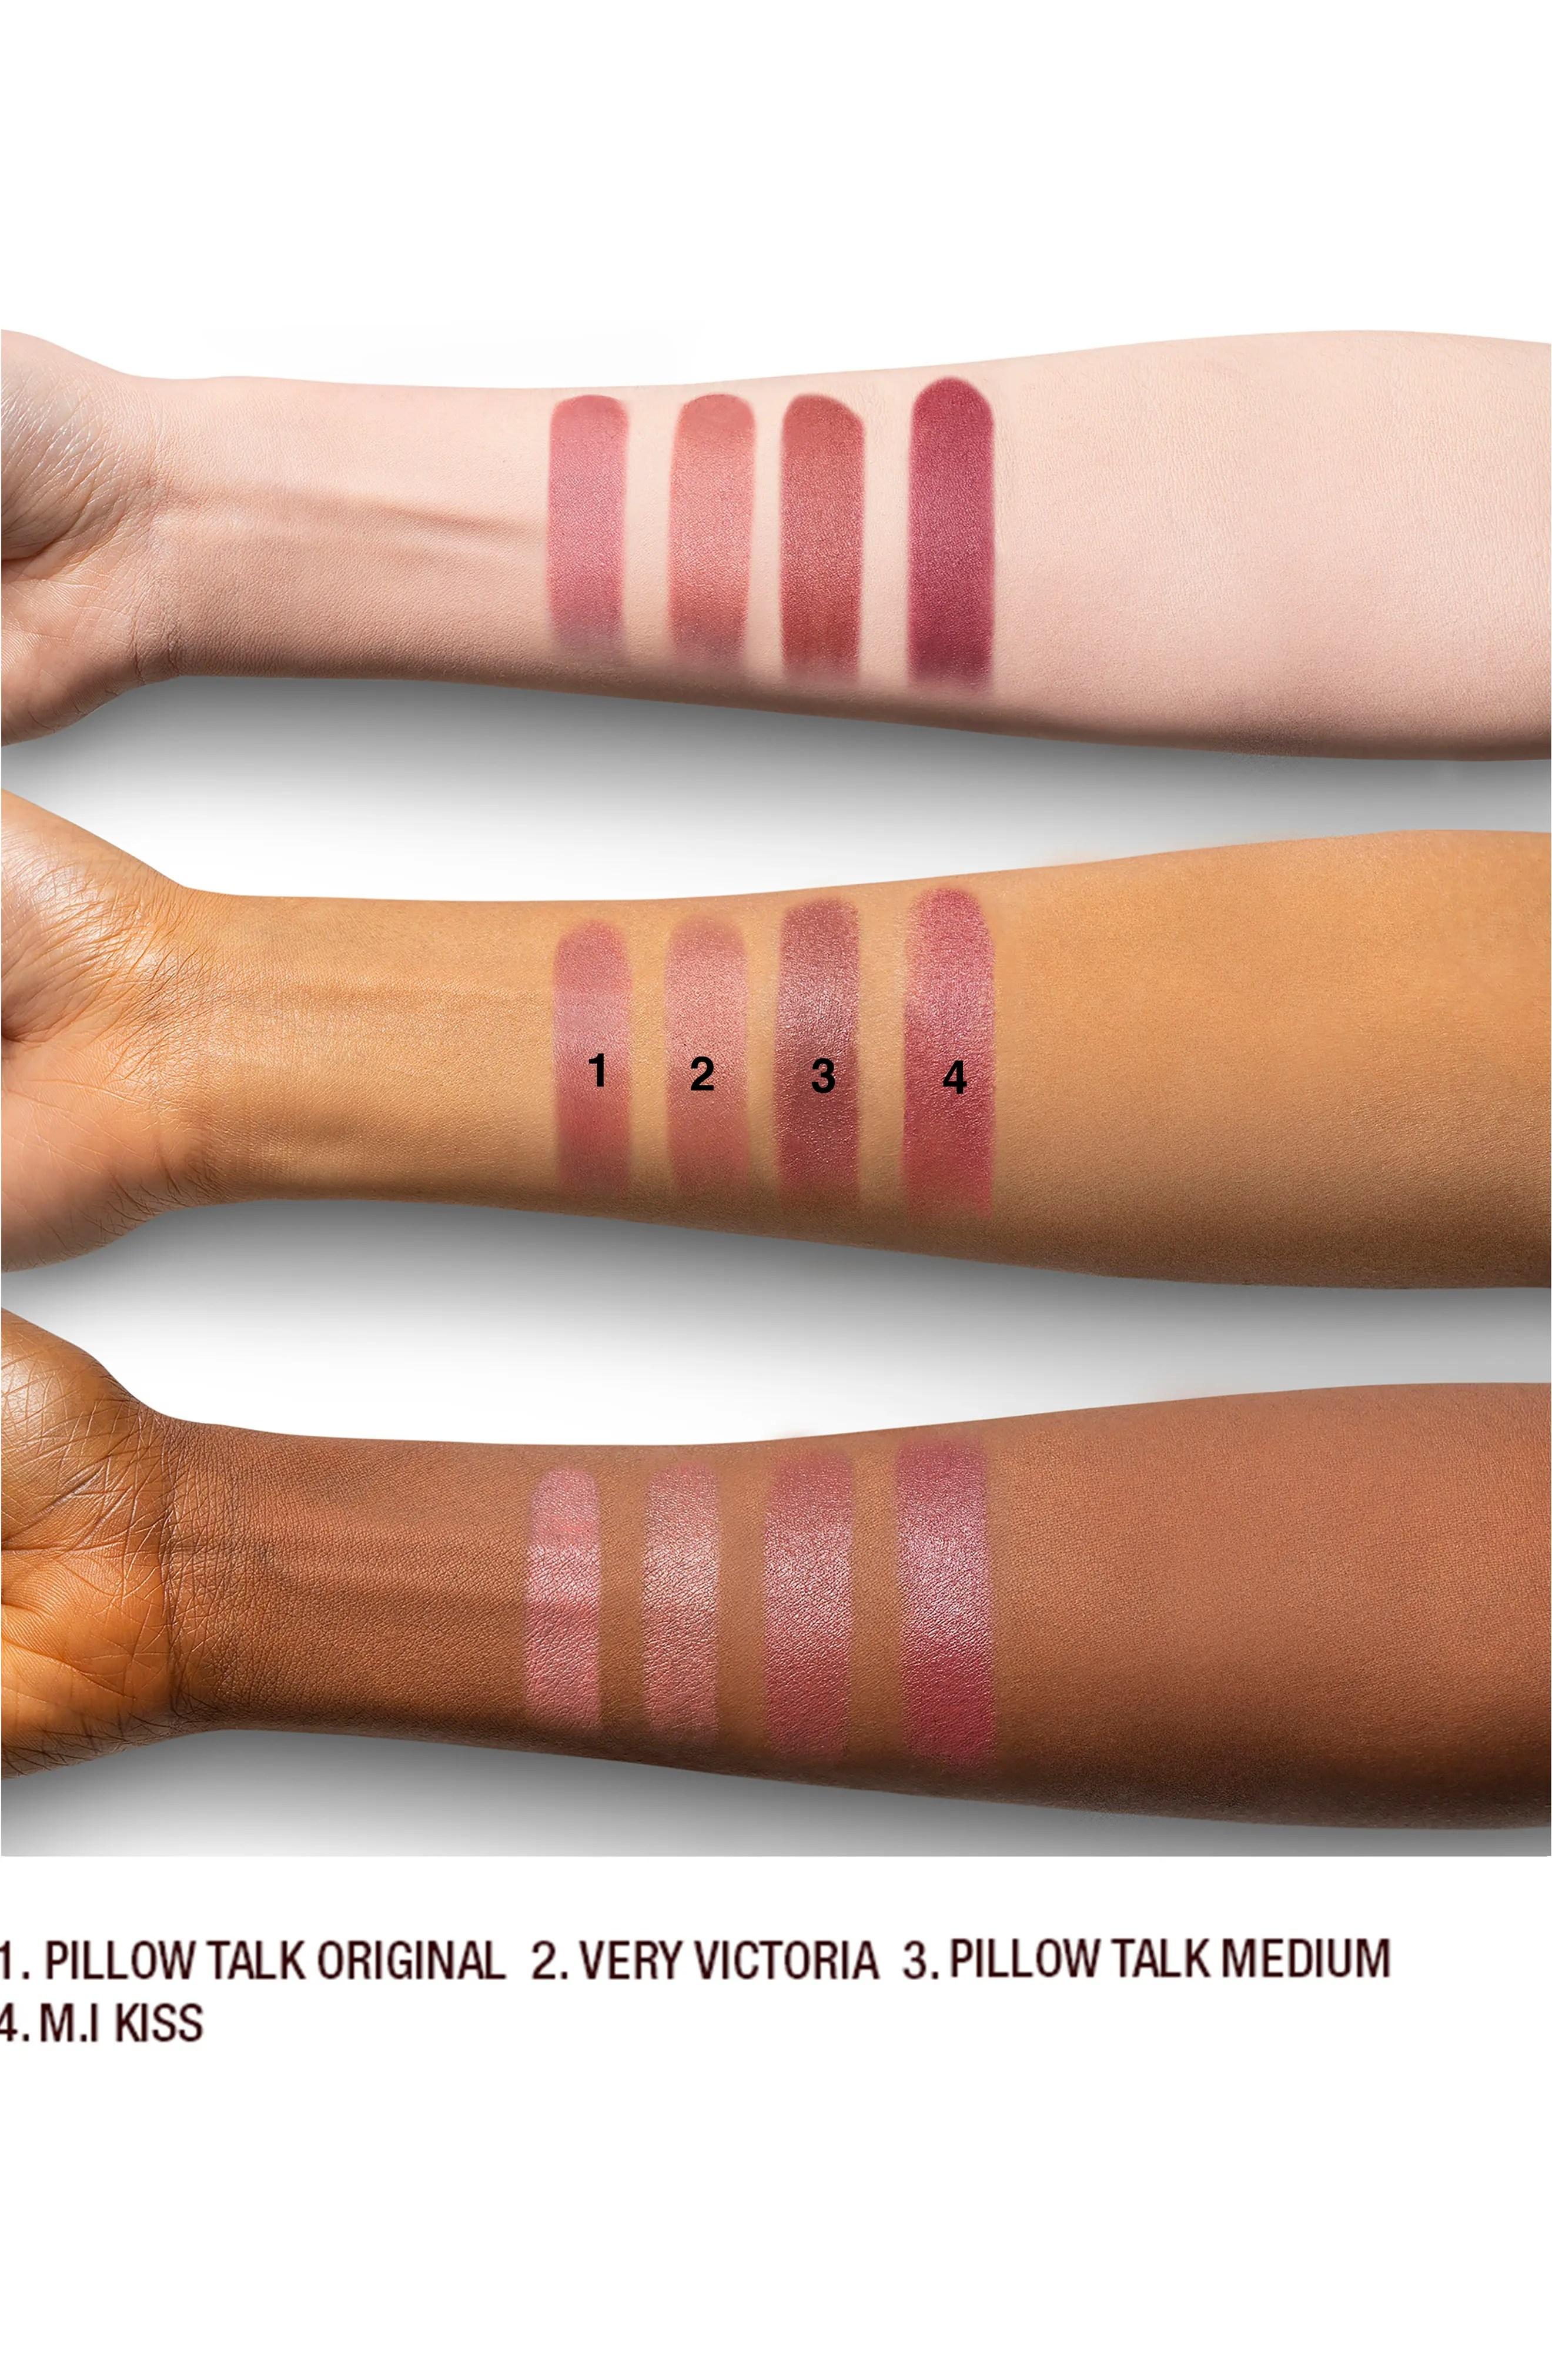 charlotte tilbury matte revolution lipstick pillow talk medium nordstrom rack